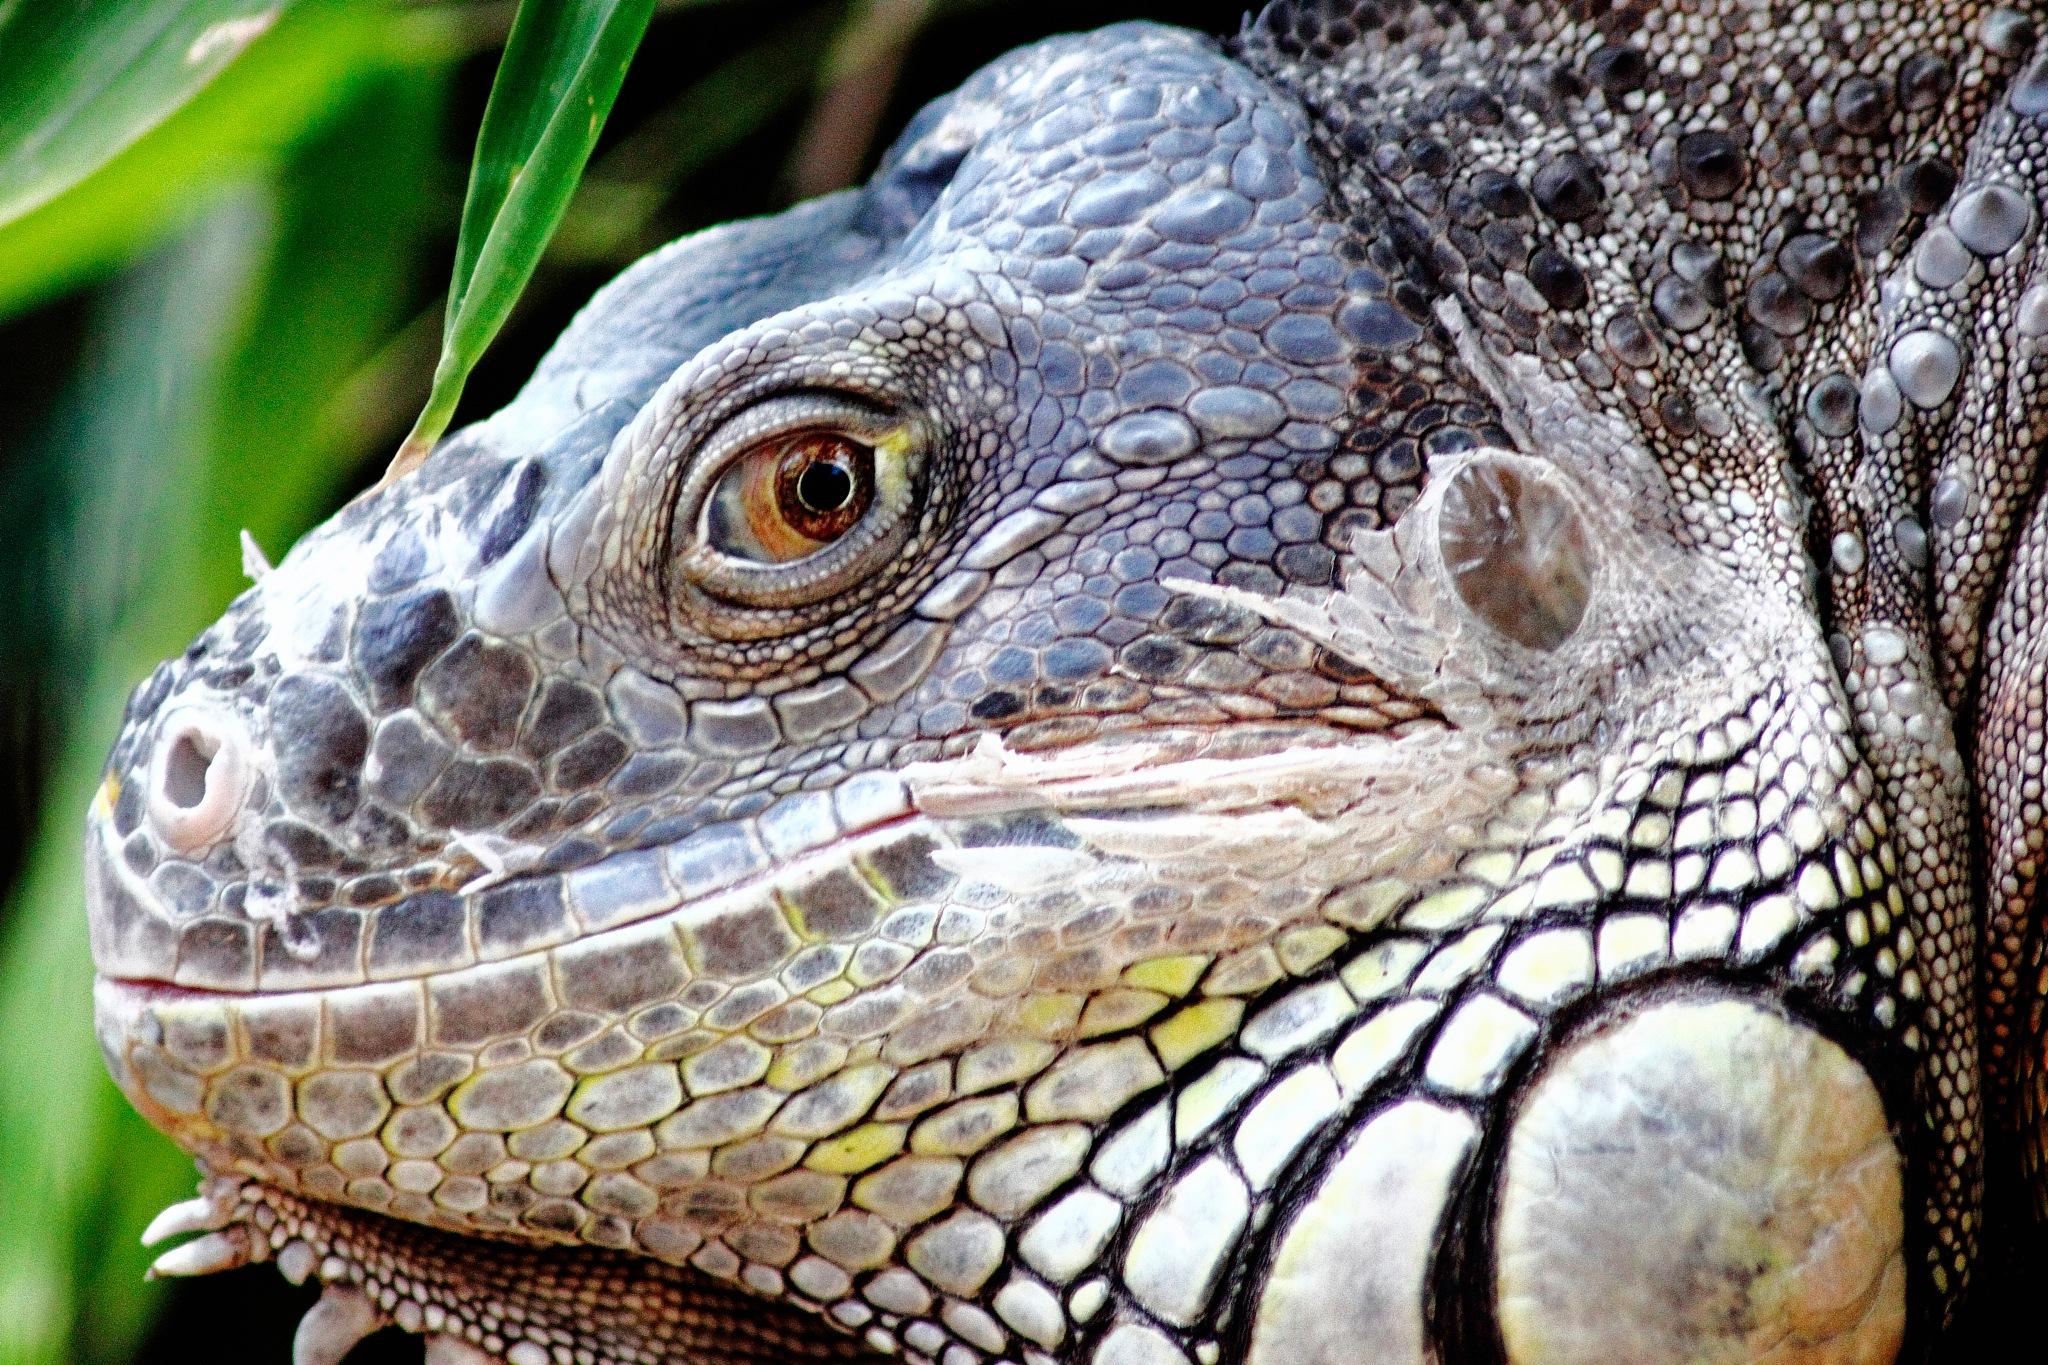 Iguana by Johnny Galloso